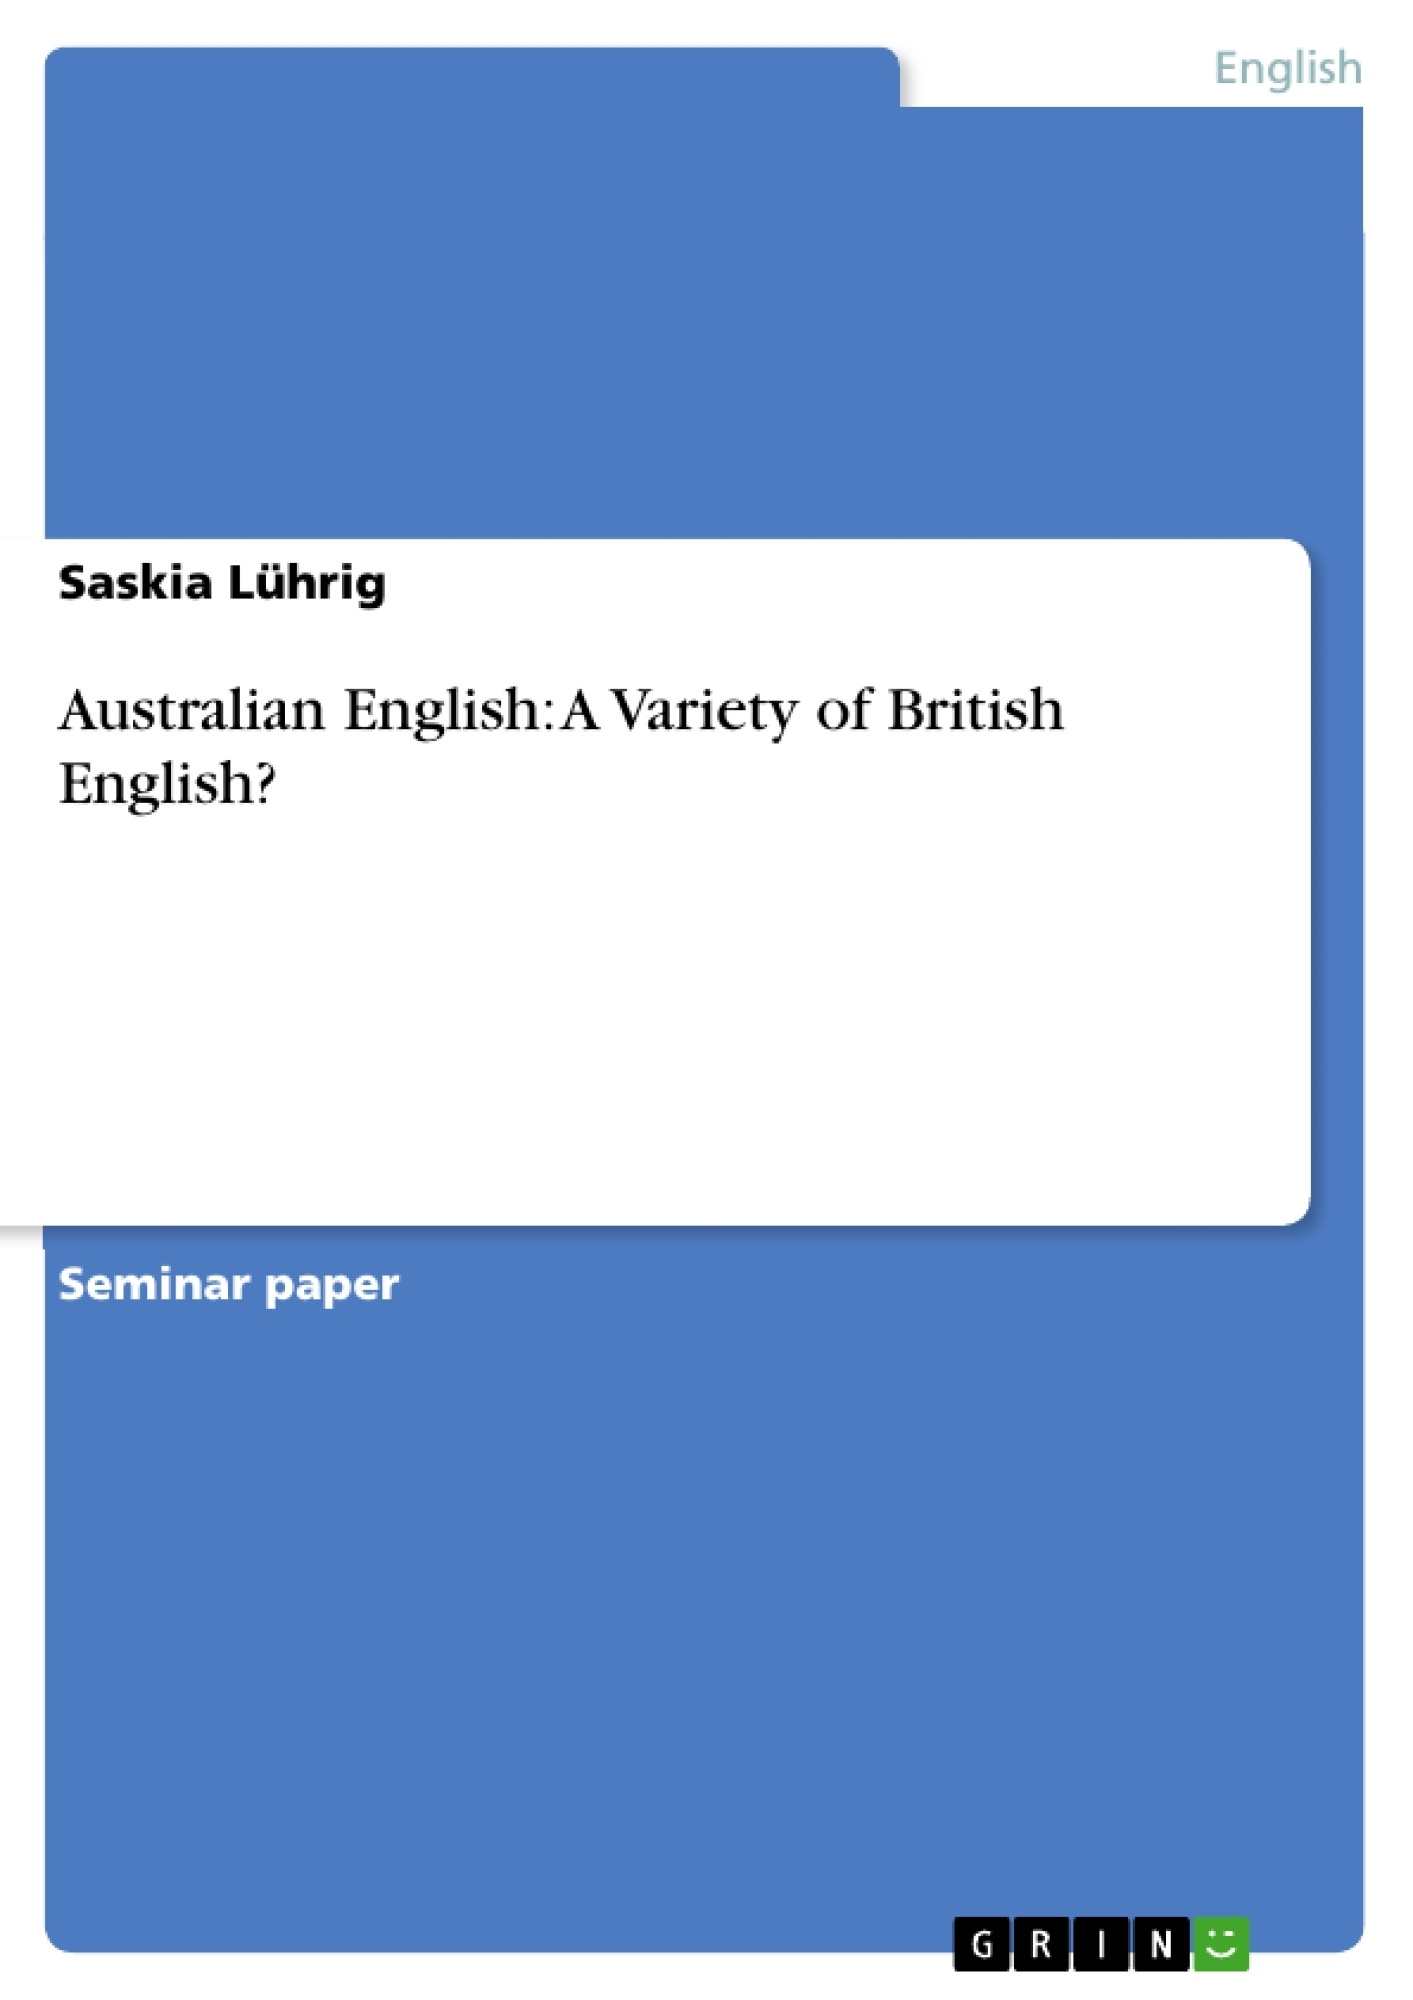 Title: Australian English: A Variety of British English?